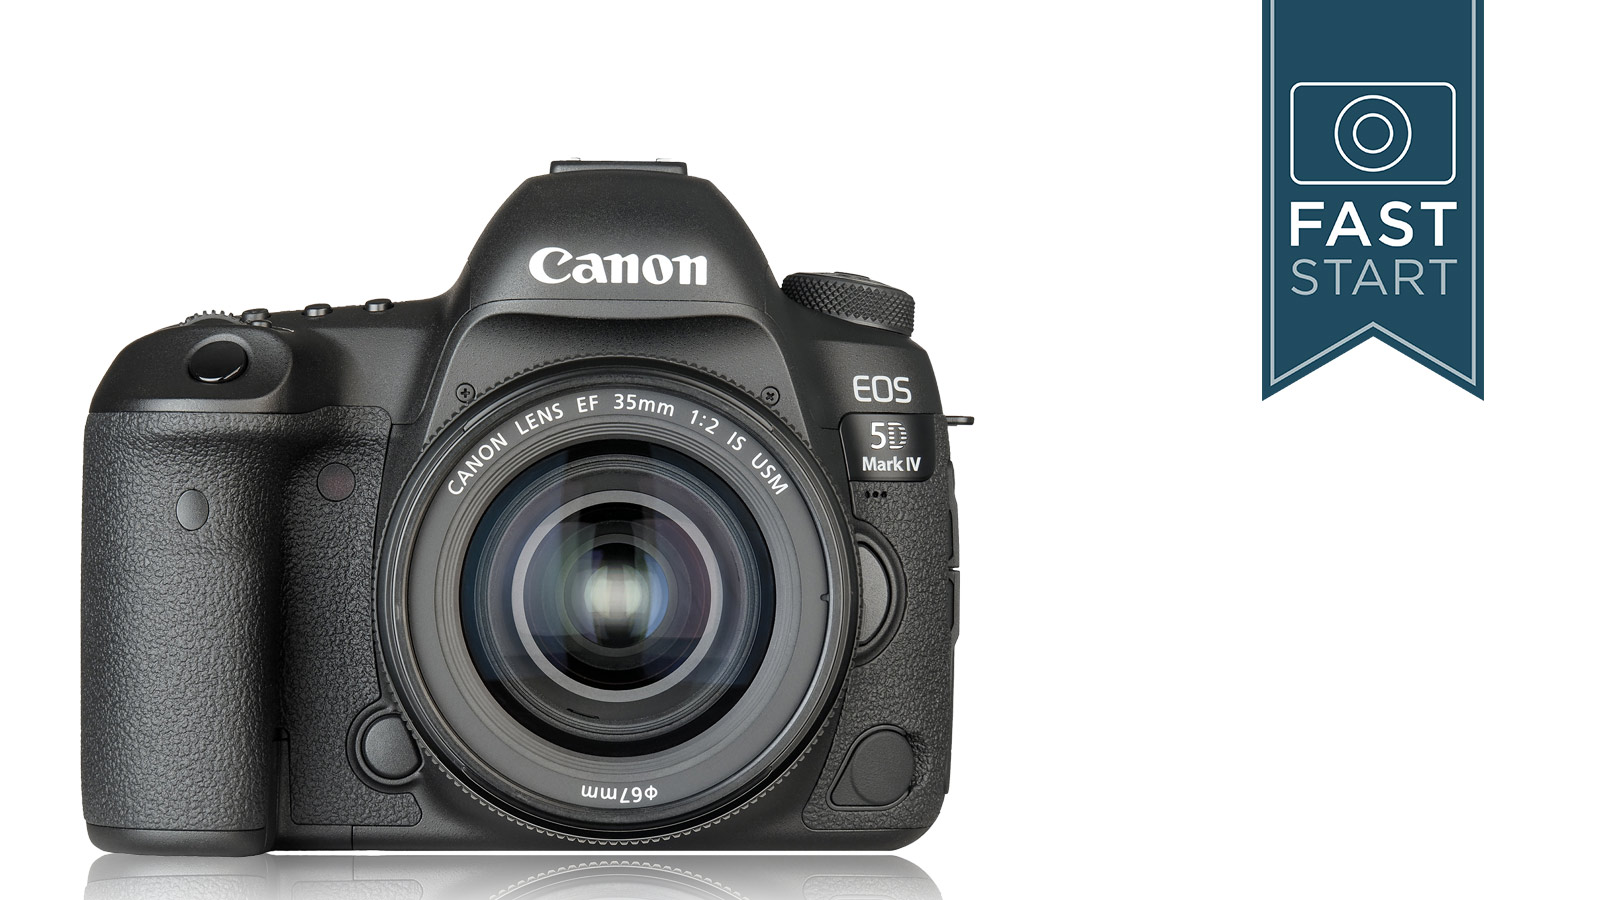 Canon EOS 5D Mark IV Fast Start with John Greengo